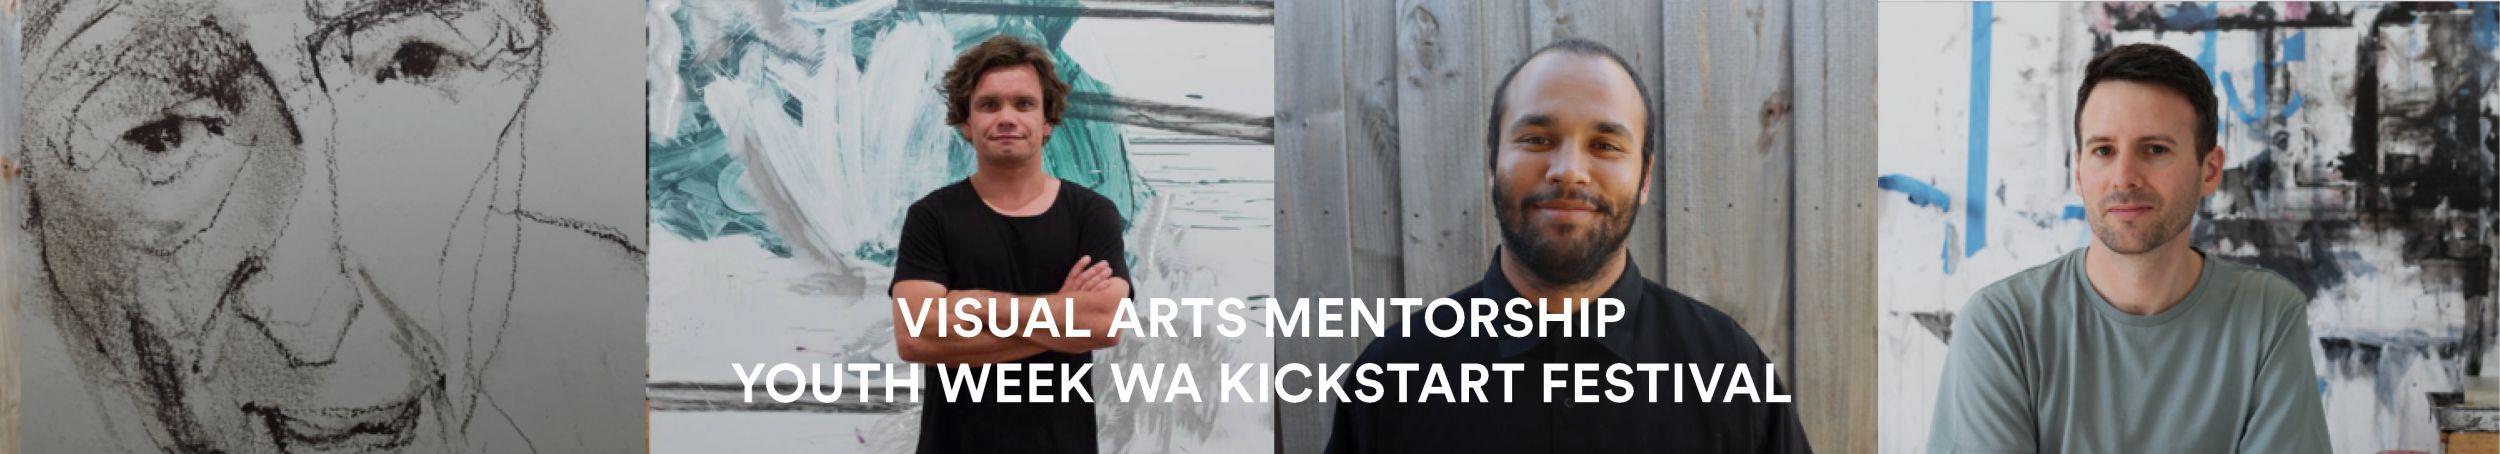 Propel Youth Arts WA | Visual Arts Mentorship | Youth Week WA KickStART Festival